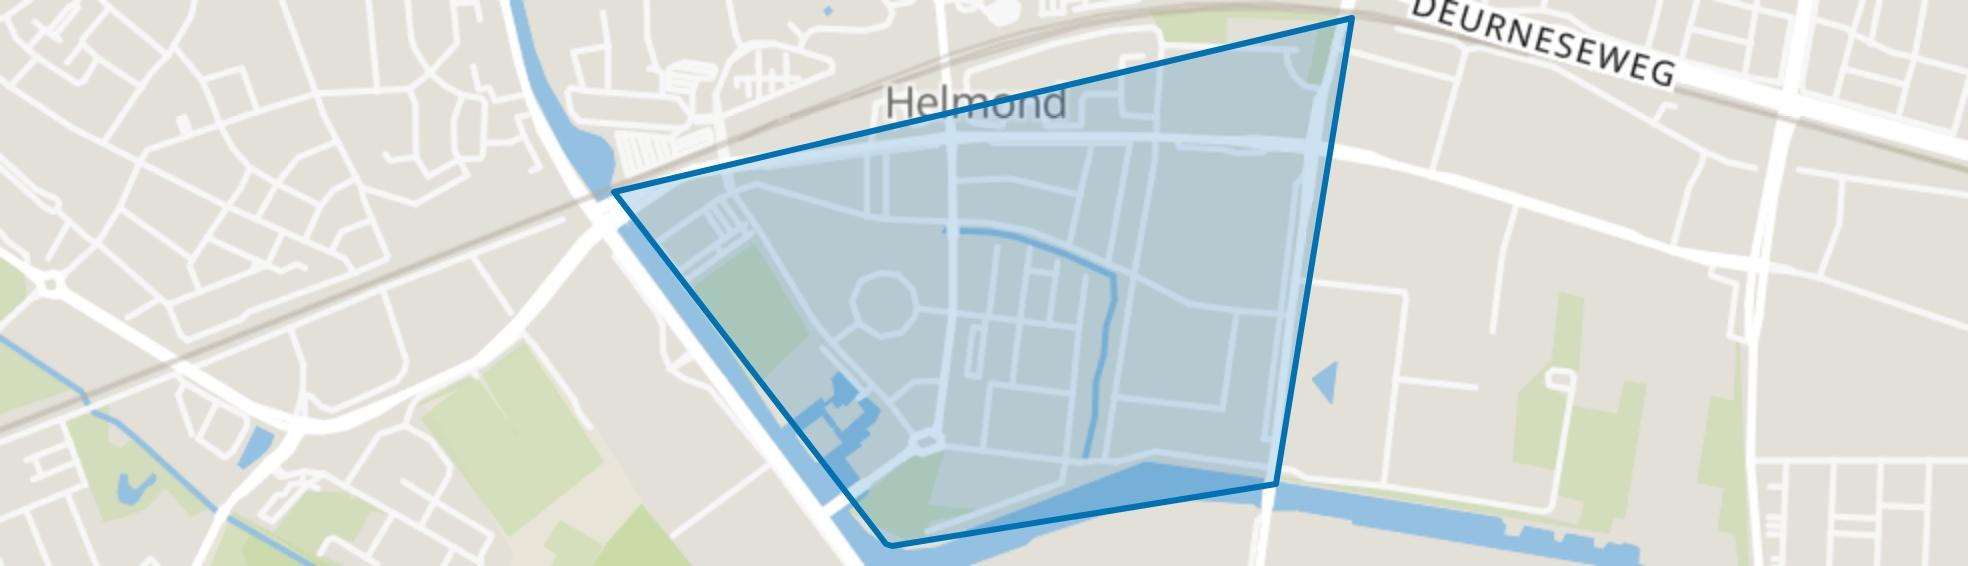 Annabuurt en Suytkade, Helmond map